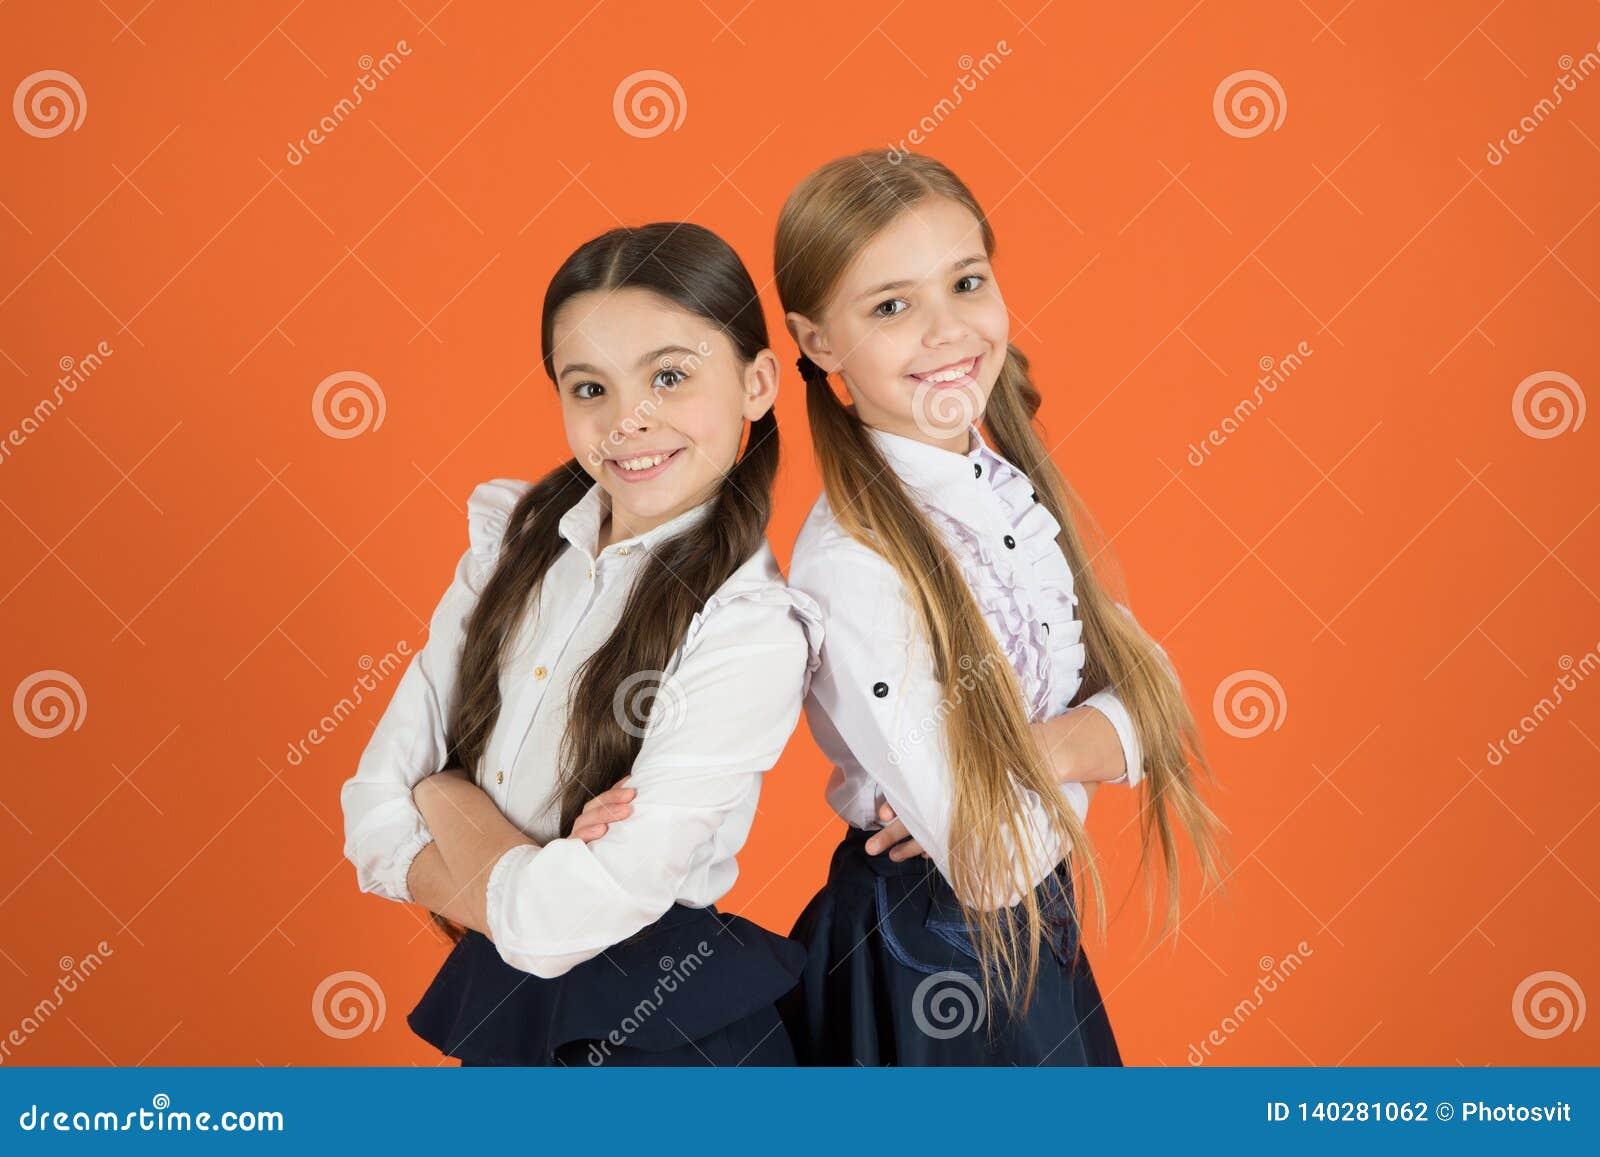 92cb9e98f4cd School children with a fashion forward look. Cute schoolgirls. Small girls  in pigtails dressed for school. Back to school fashion.